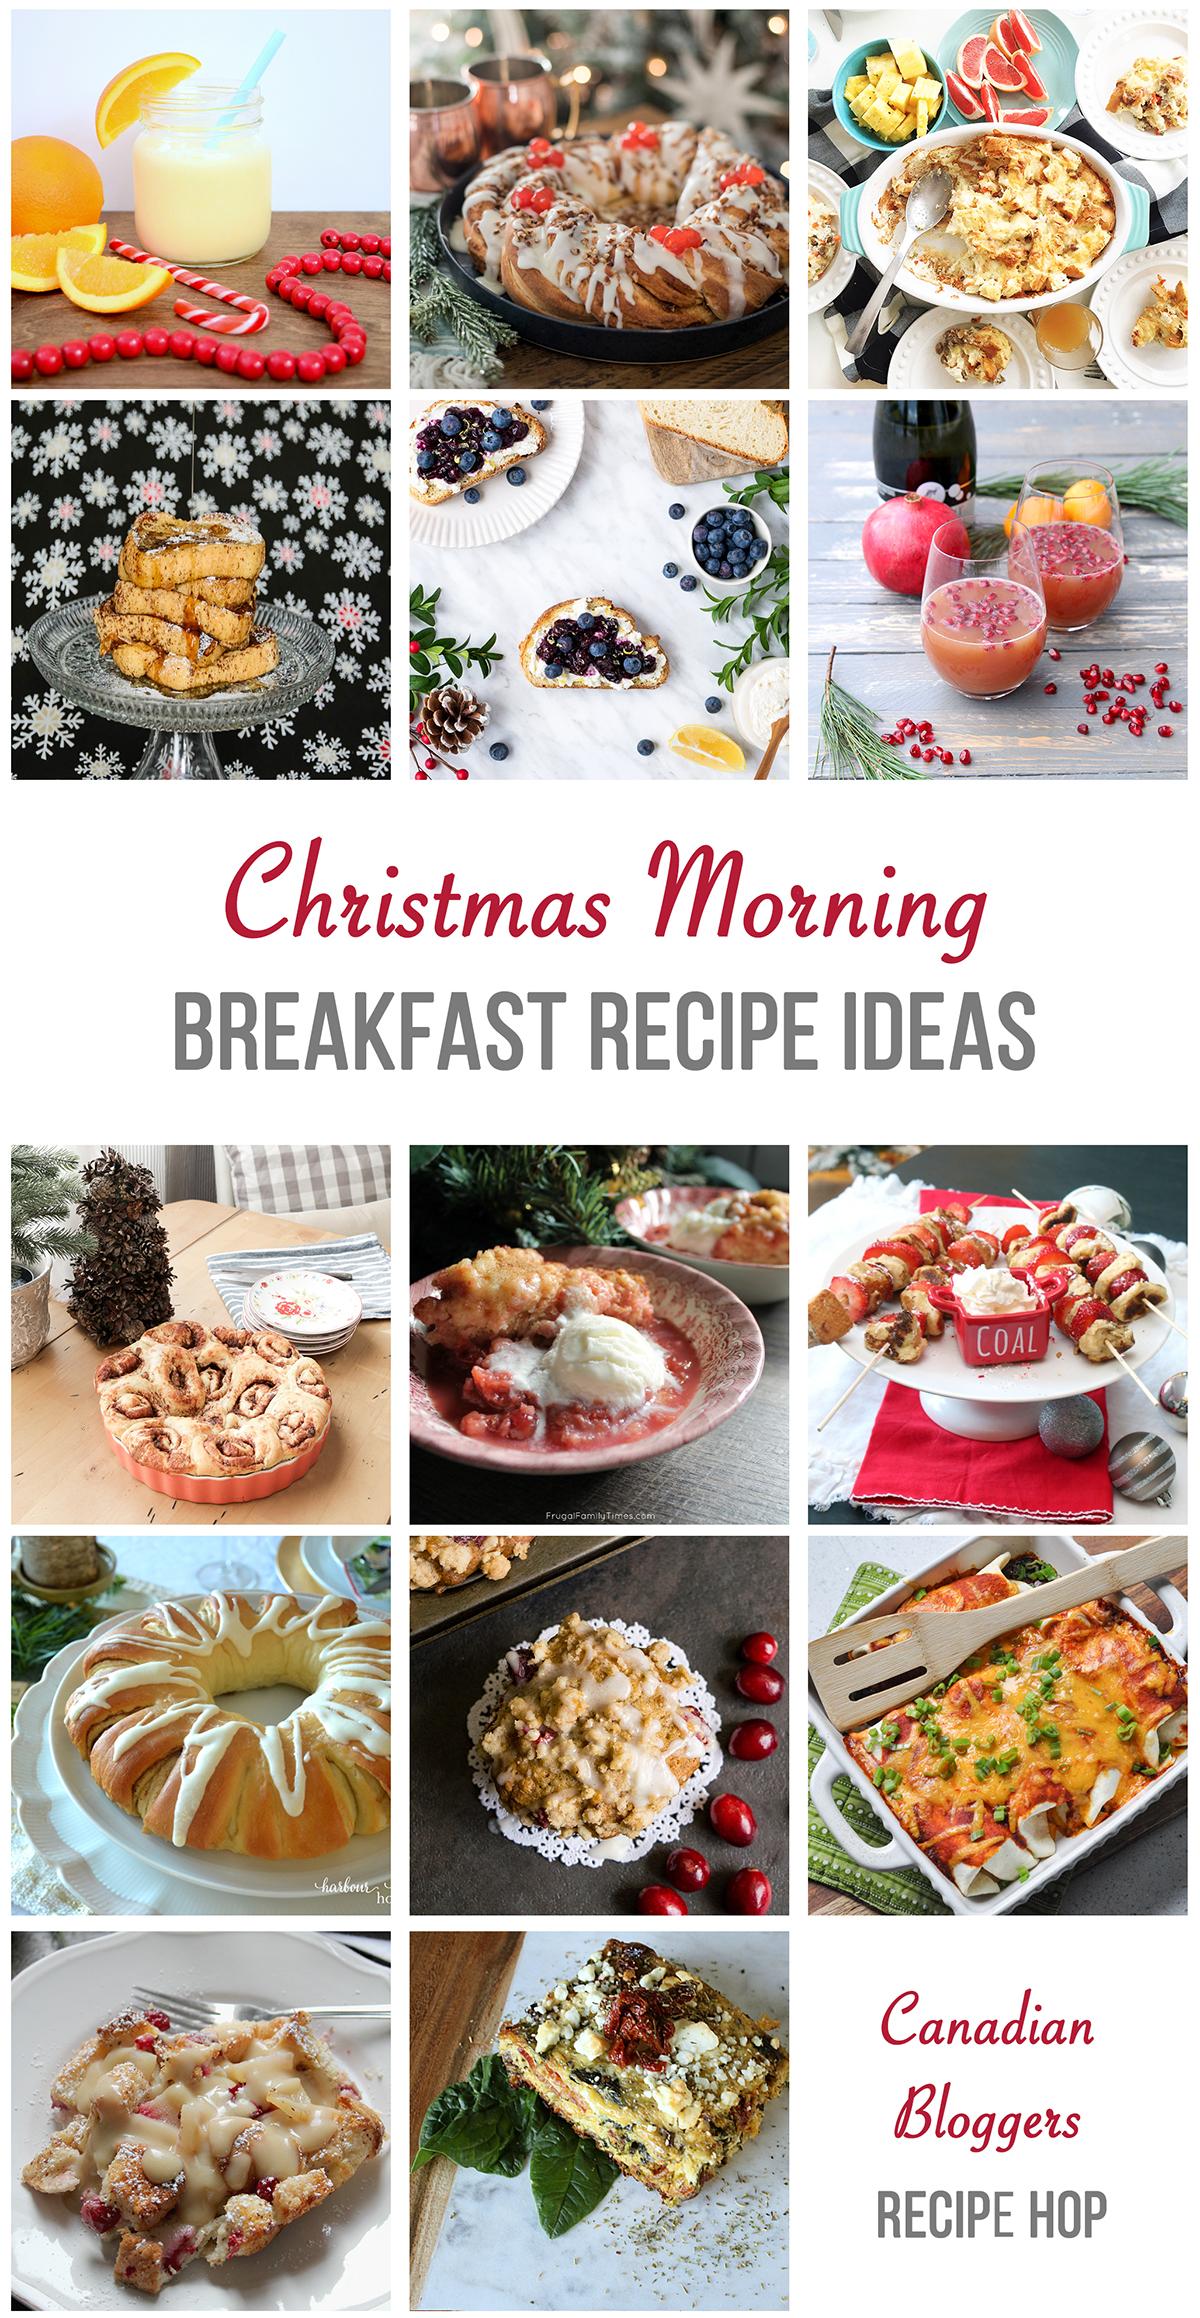 Best-Christmas-Morning-Breakfast-Recipe-Ideas